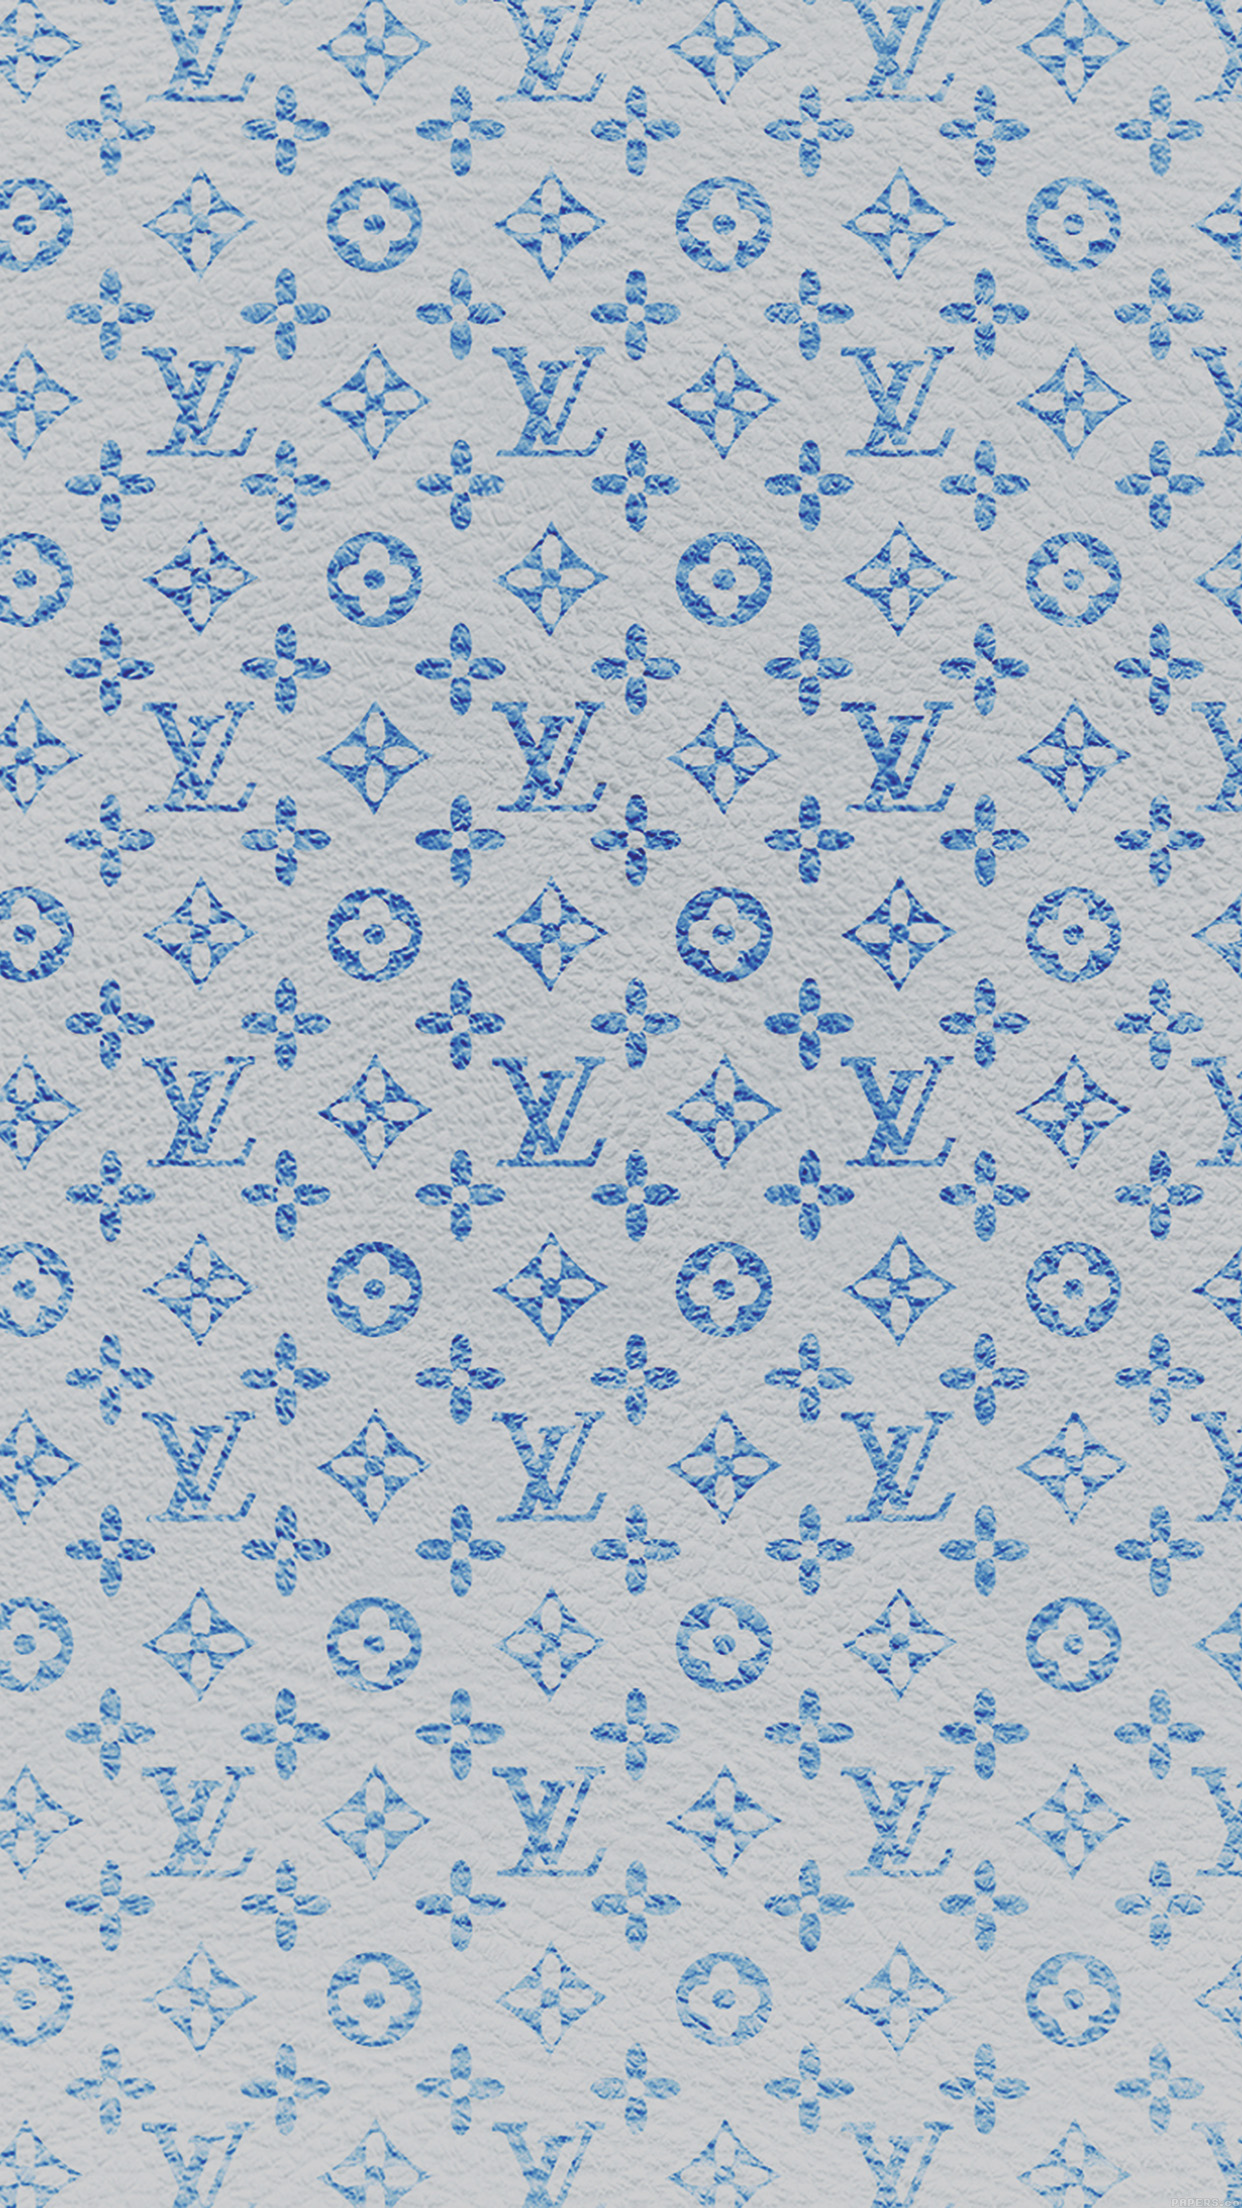 Vf21 Louis Vuitton Blue Pattern Art Papers Co